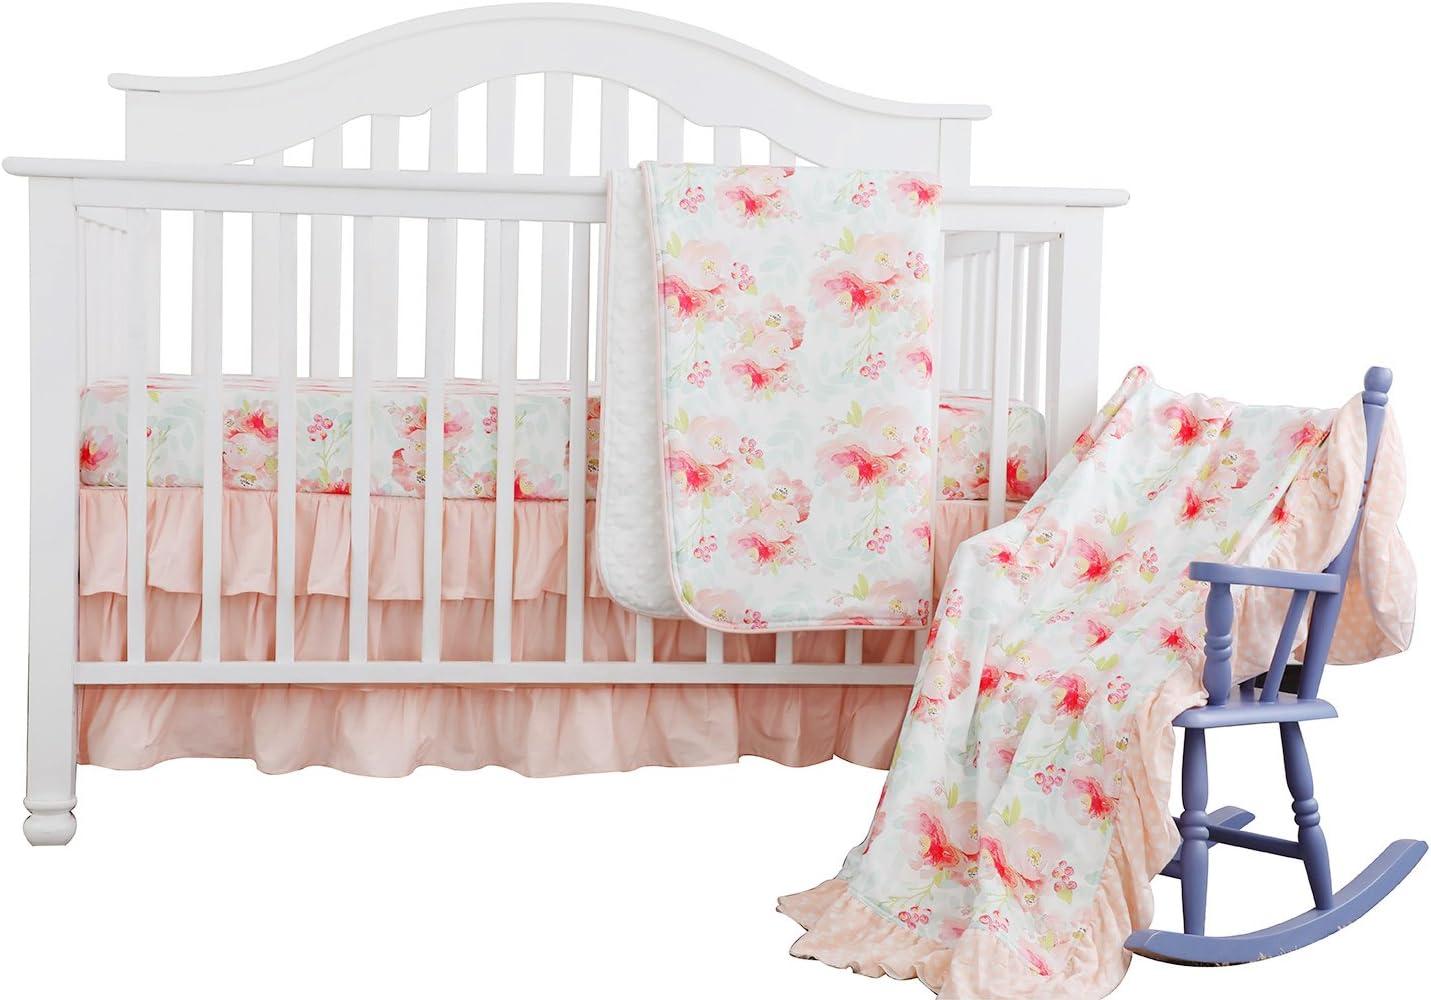 sahaler blush mint girls crib bedding set boho bohemian floral nursery baby bedding mini crib sheet floral ruffled crib skirt crib rail cover 3